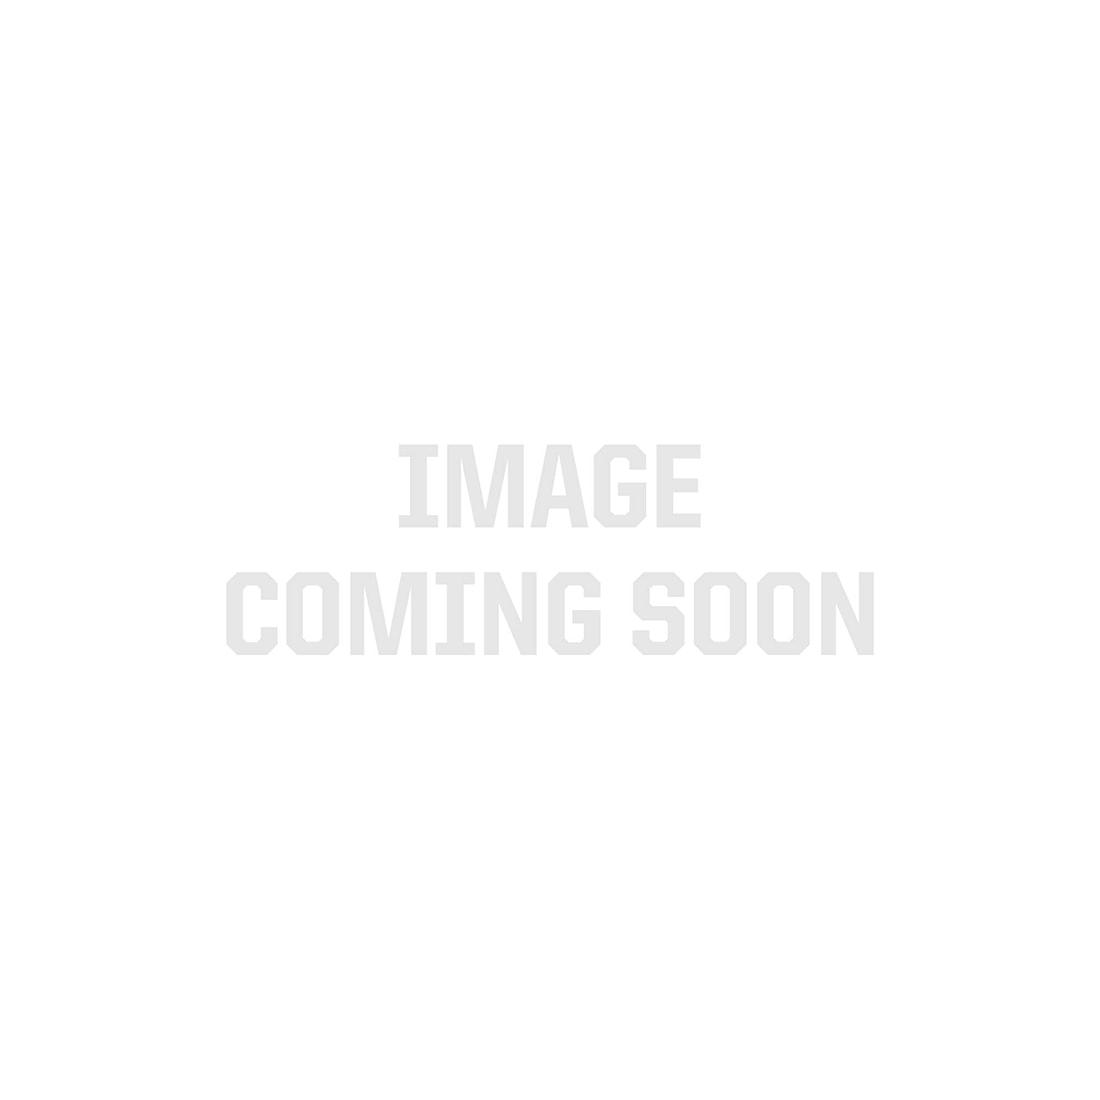 G50mm Clear Glass Dimmable LED Light Bulb, E26 (Medium) Base, 1.4 watt (Extreme Warm White)